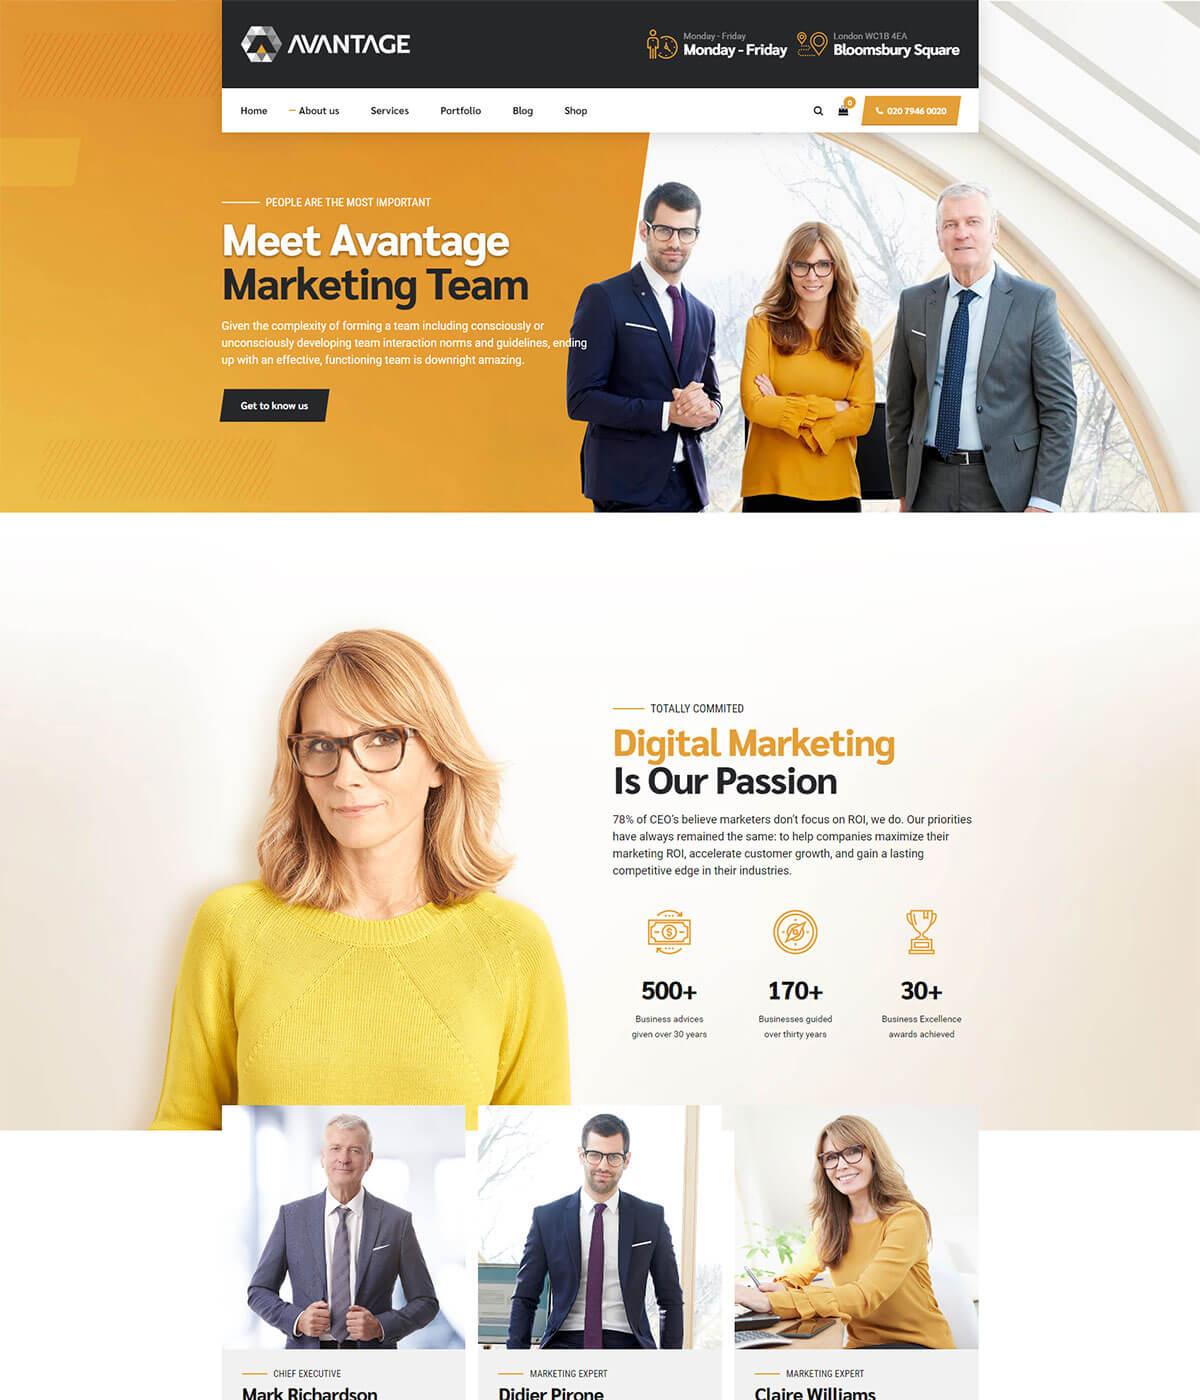 https://avantage.bold-themes.com/wp-content/uploads/2019/05/marketing-03-team.jpg